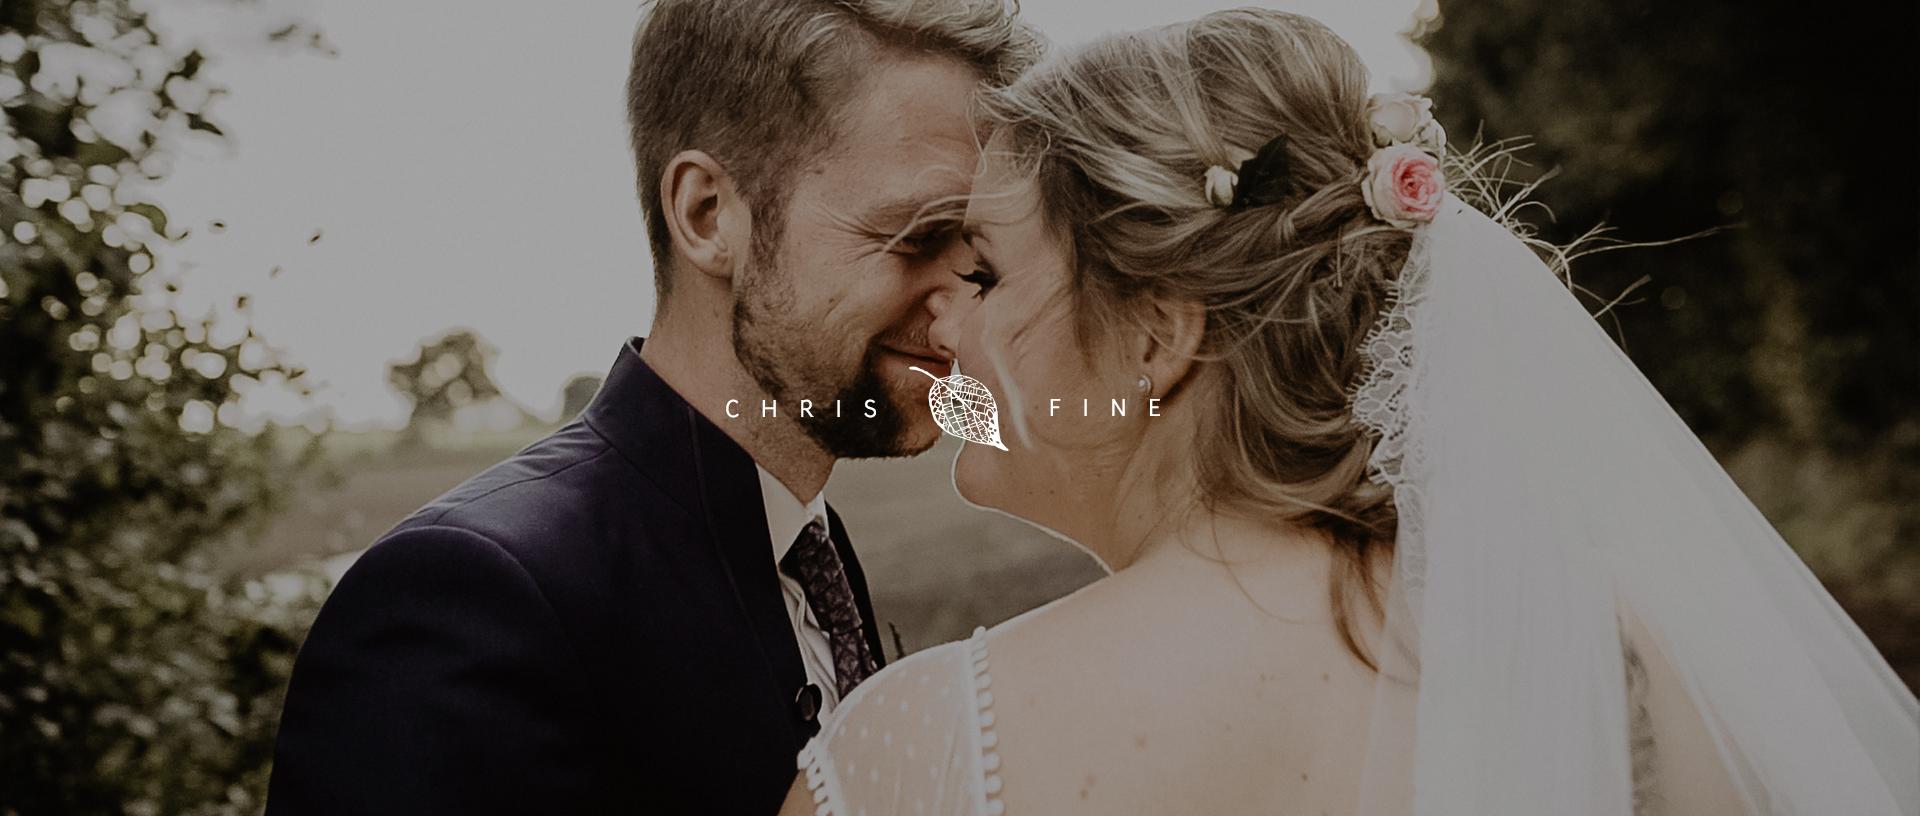 Chris + Fine | hamburg, Germany | The Brides Parents Farm